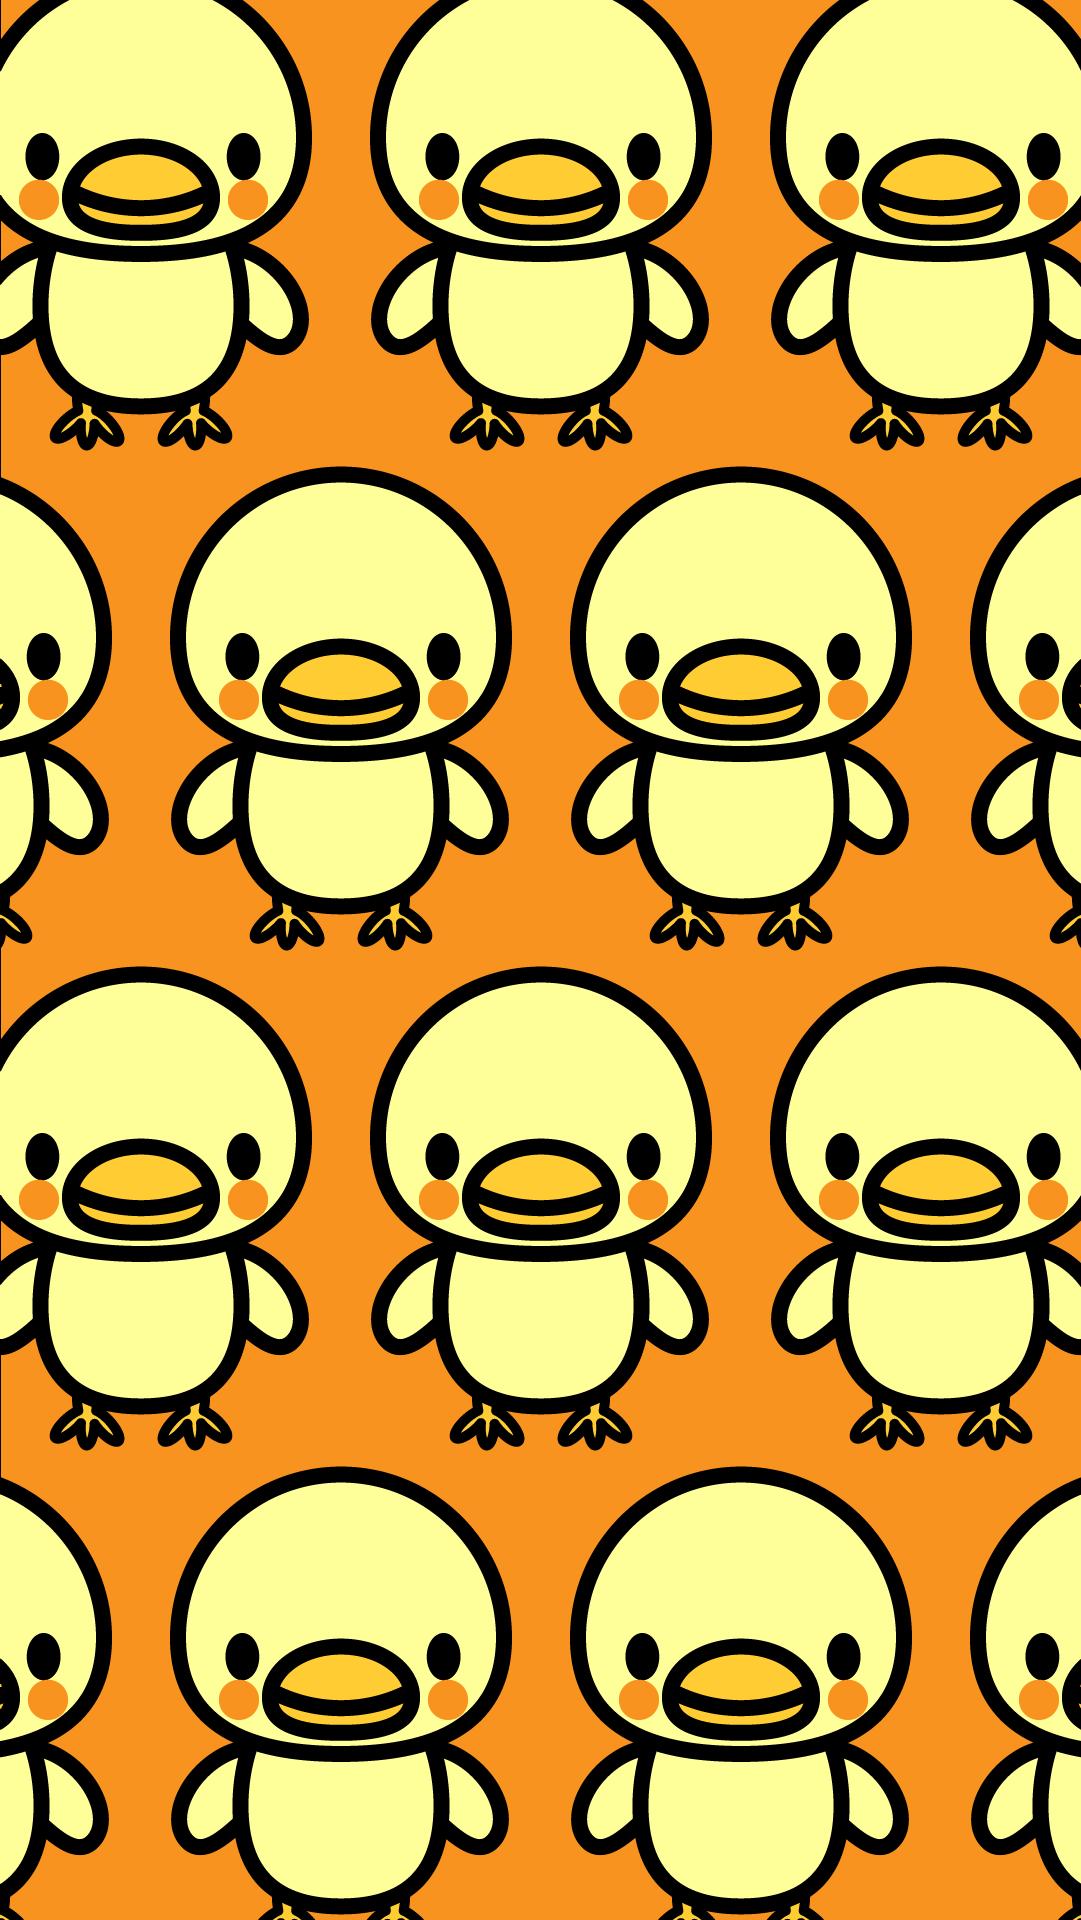 wallpaper3_chick-fill-orange-iphone